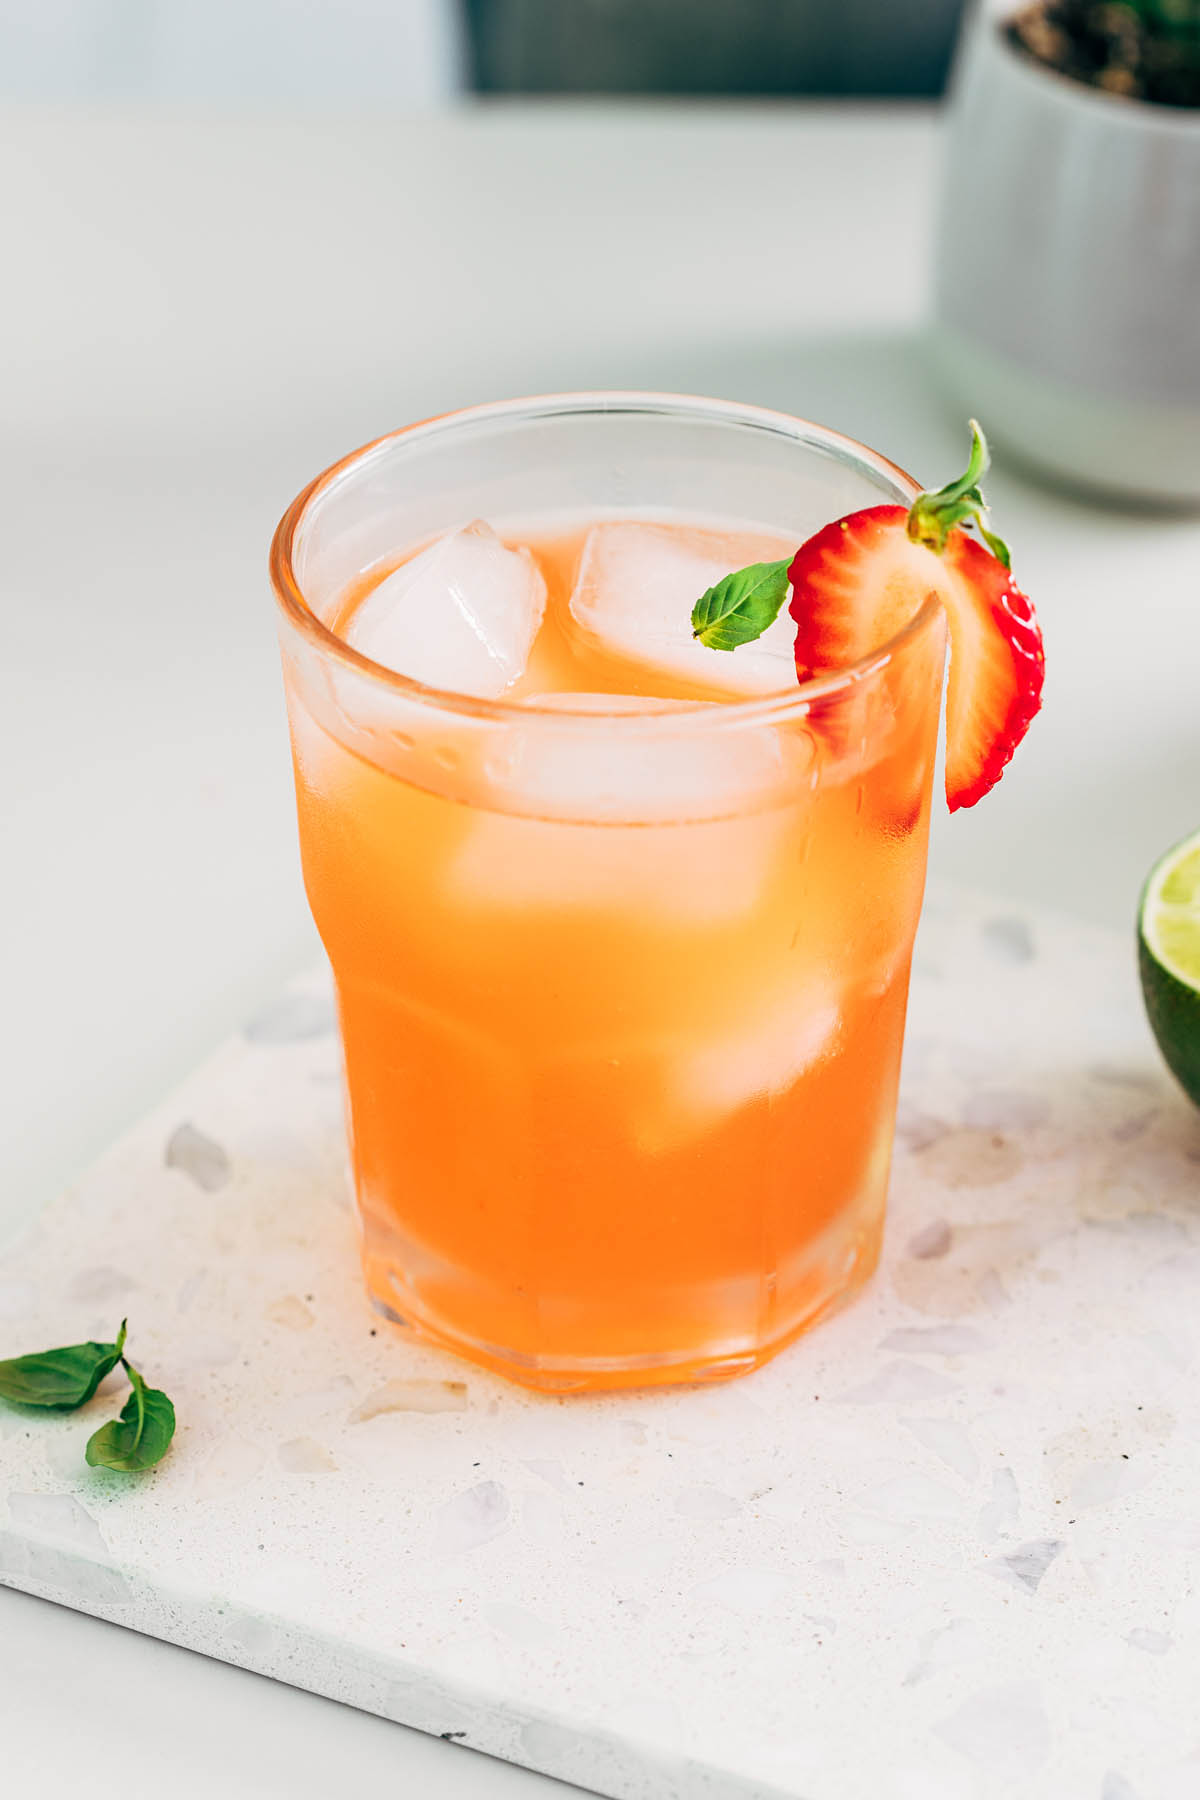 A strawberry basil margarita garnished with a strawberry.